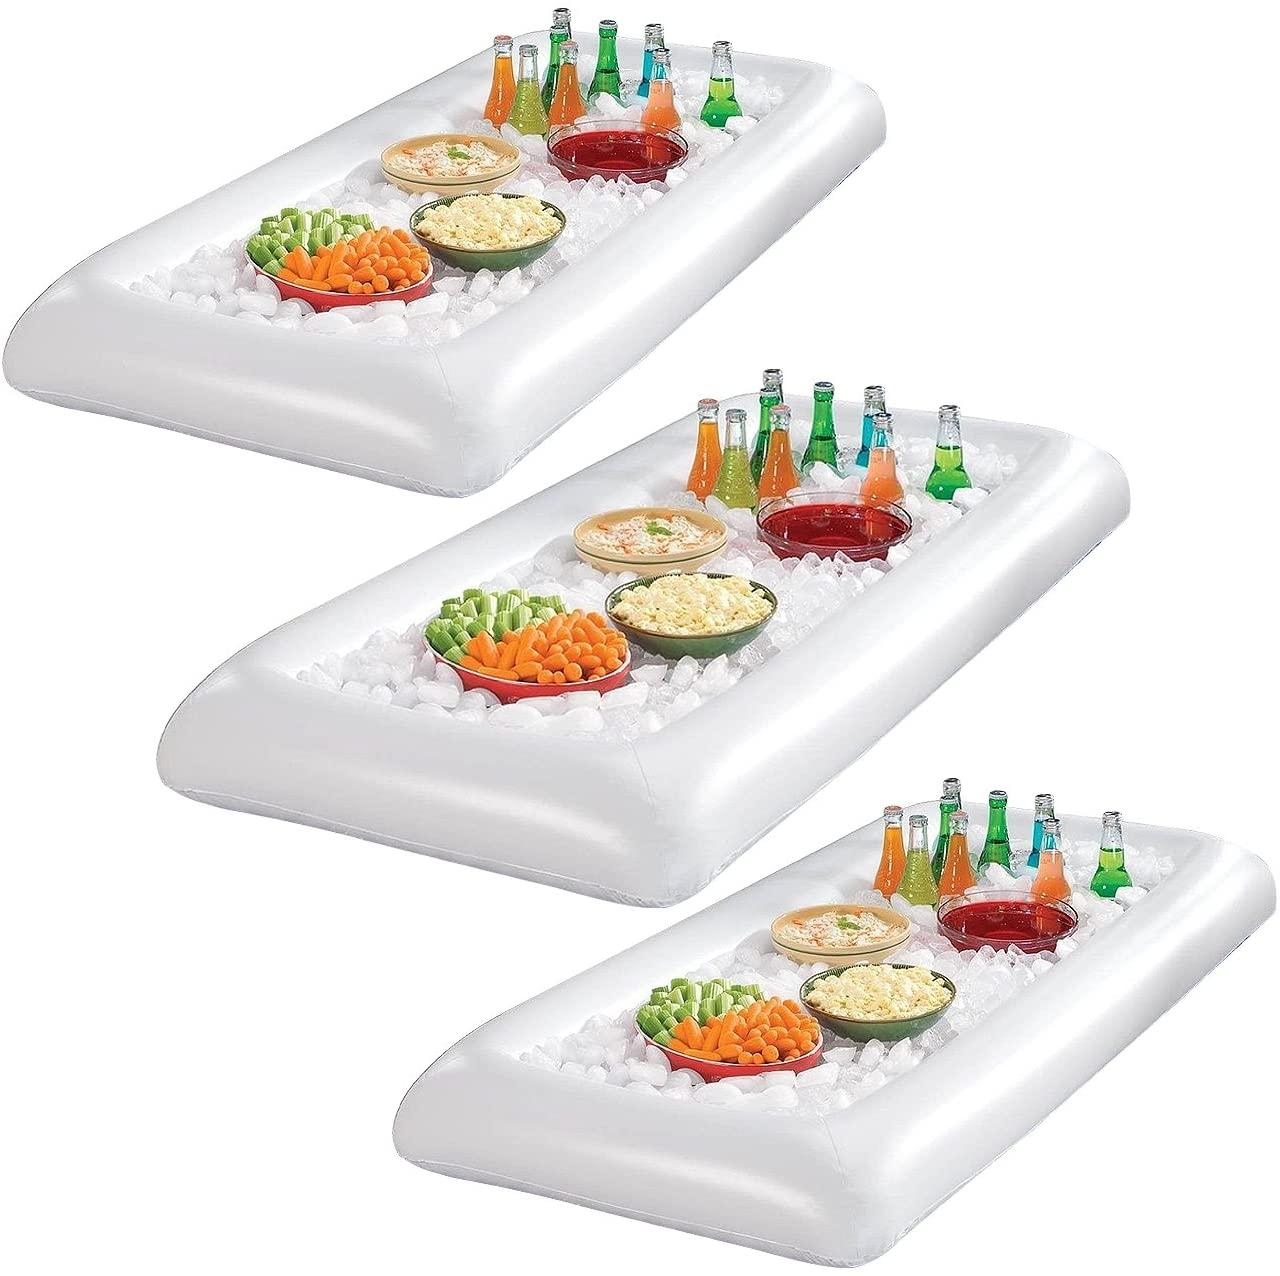 Sorbus White Inflatable Drinks & Food Serving Bar with Drain Plug (3 Salad Bars)